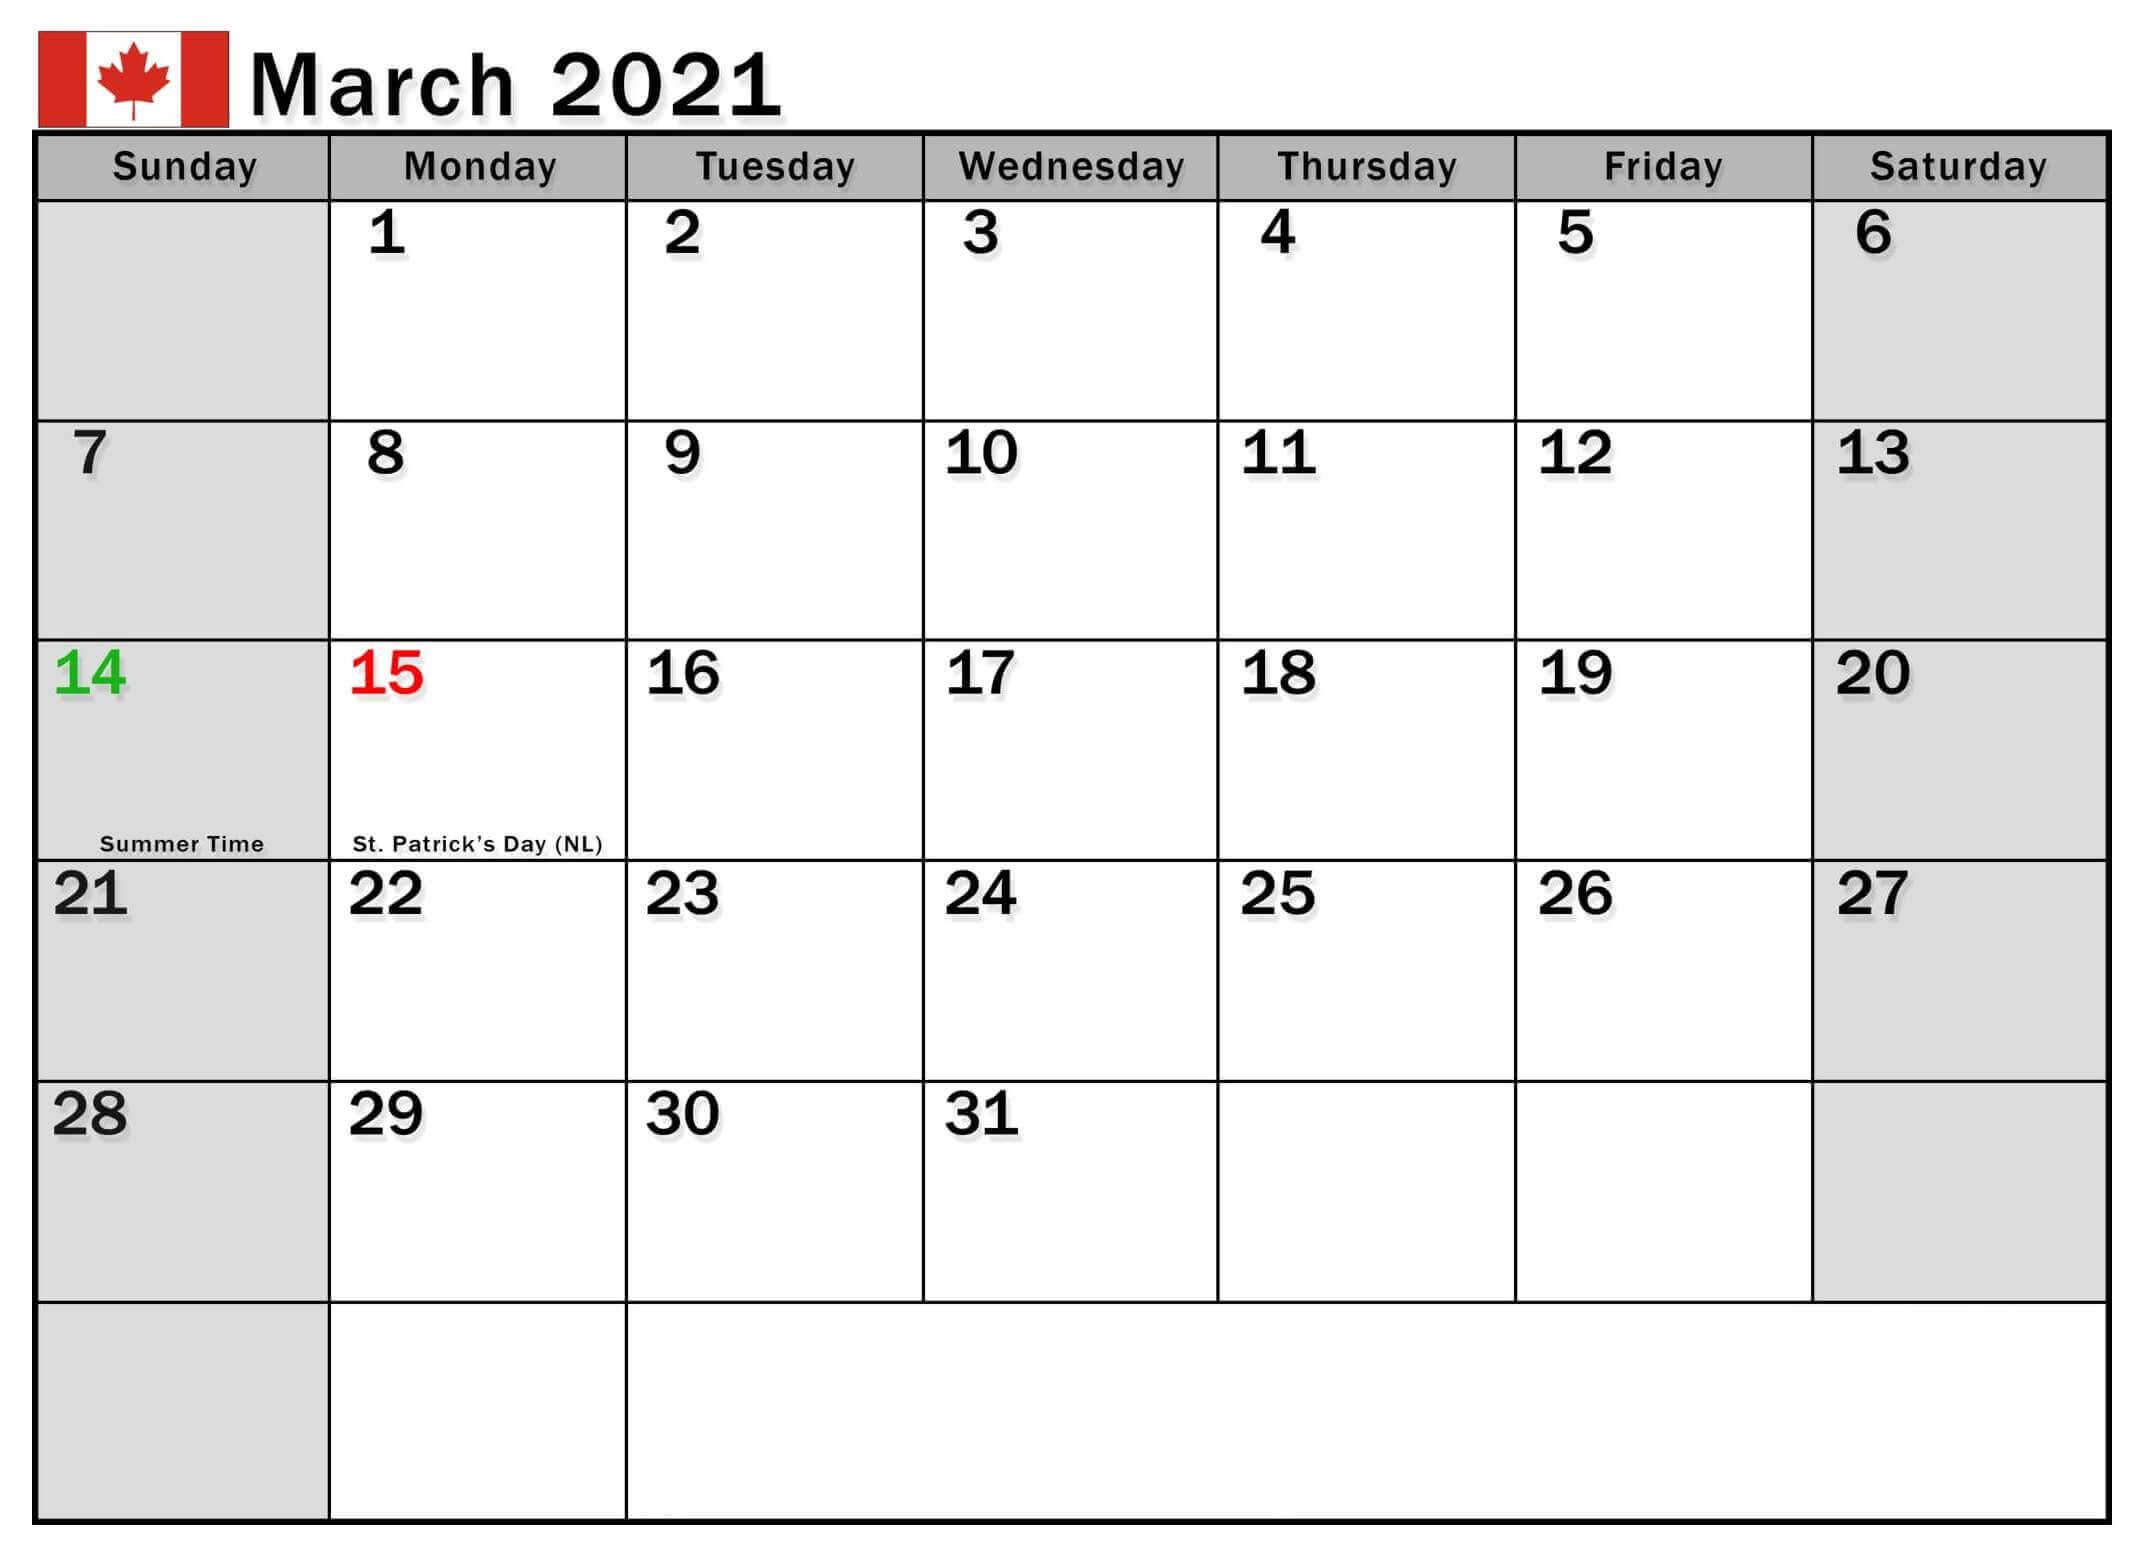 March 2021 Calendar with Holidays Canada